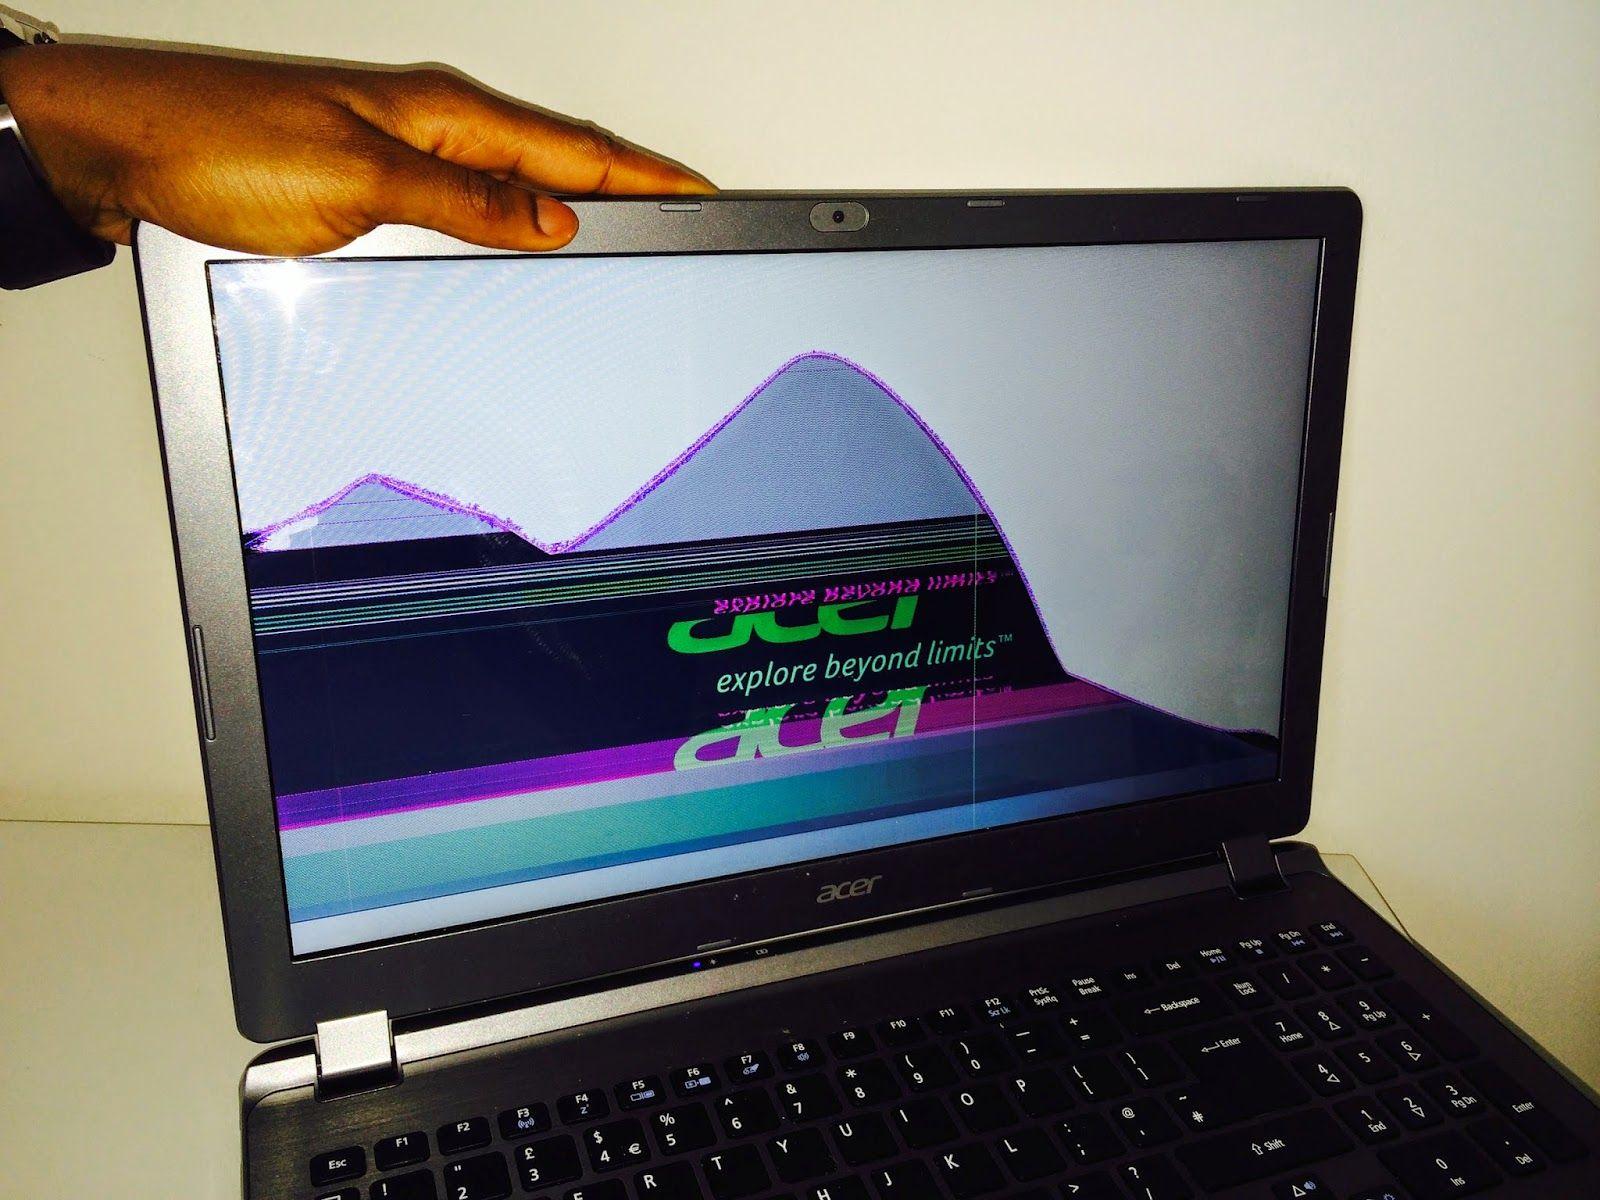 OMG 33 Laptop Damage Photos for Web Designers | Laptop